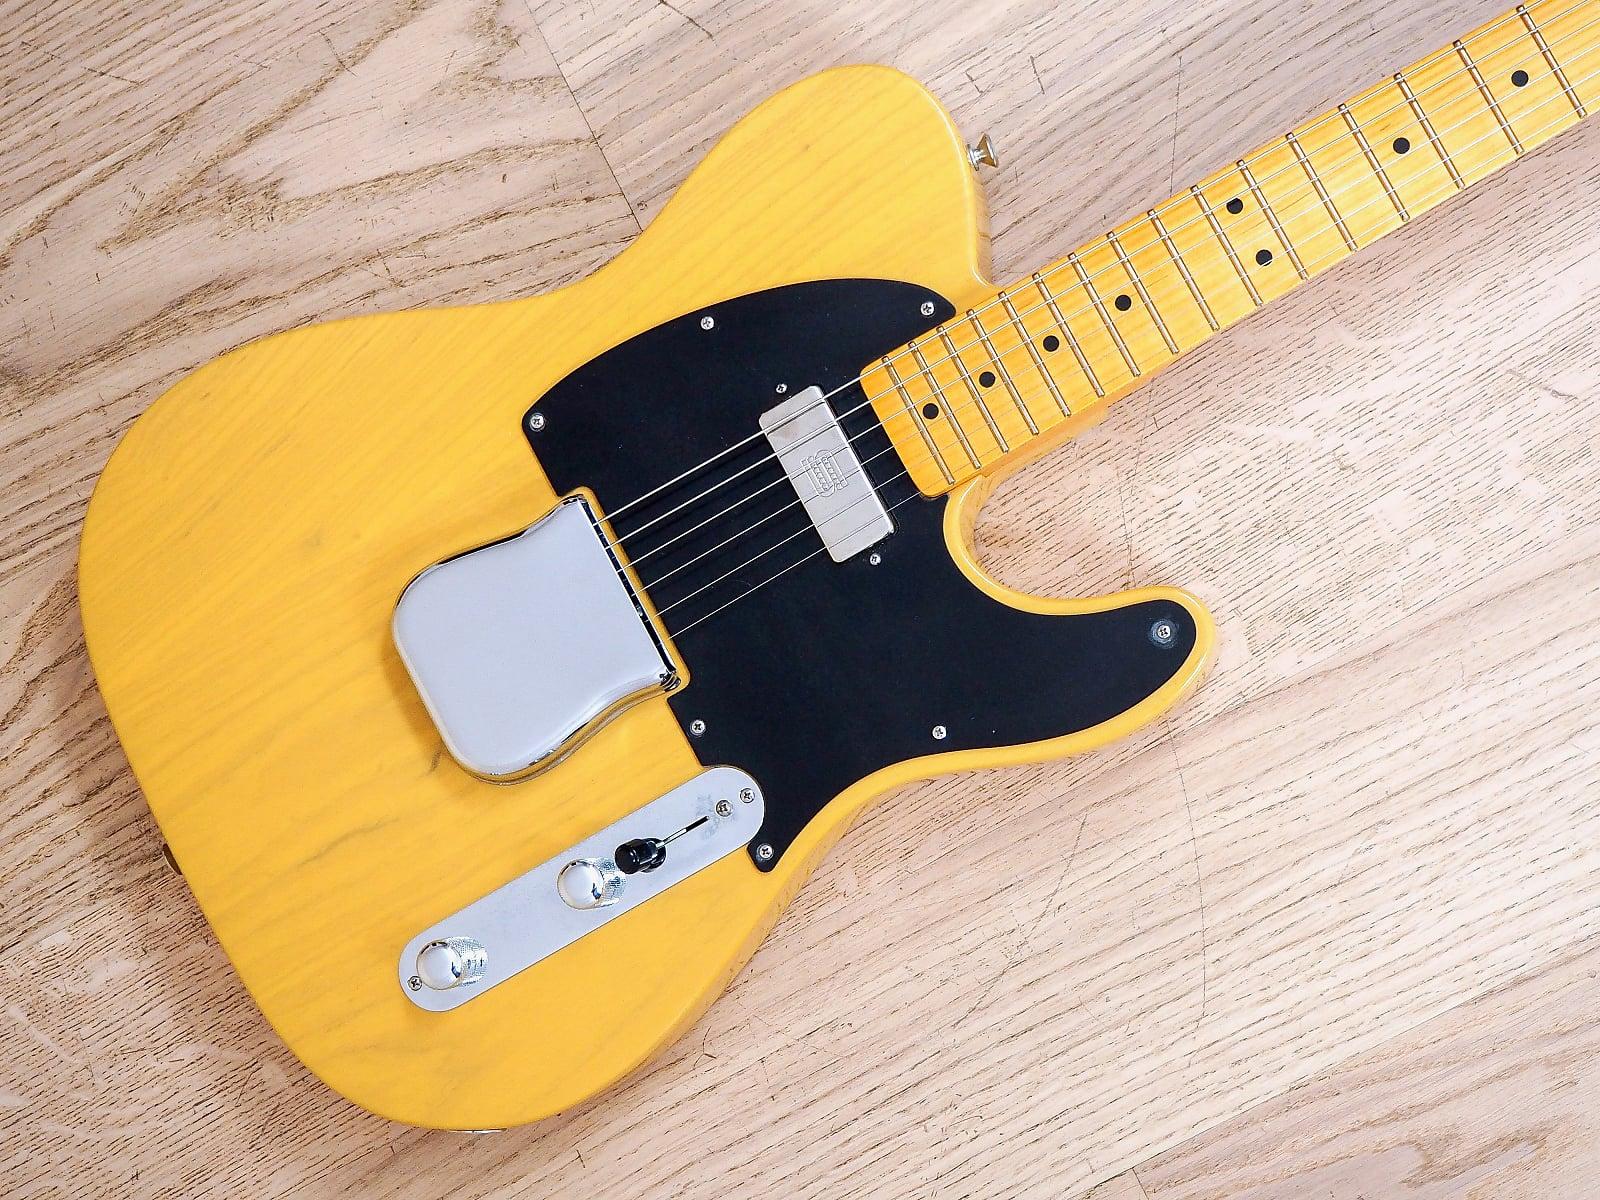 Gran roble Amoroso Pulido  2011 Fender Vintage Hot Rod '52 Telecaster Butterscotch, American Vintage  w/ohc